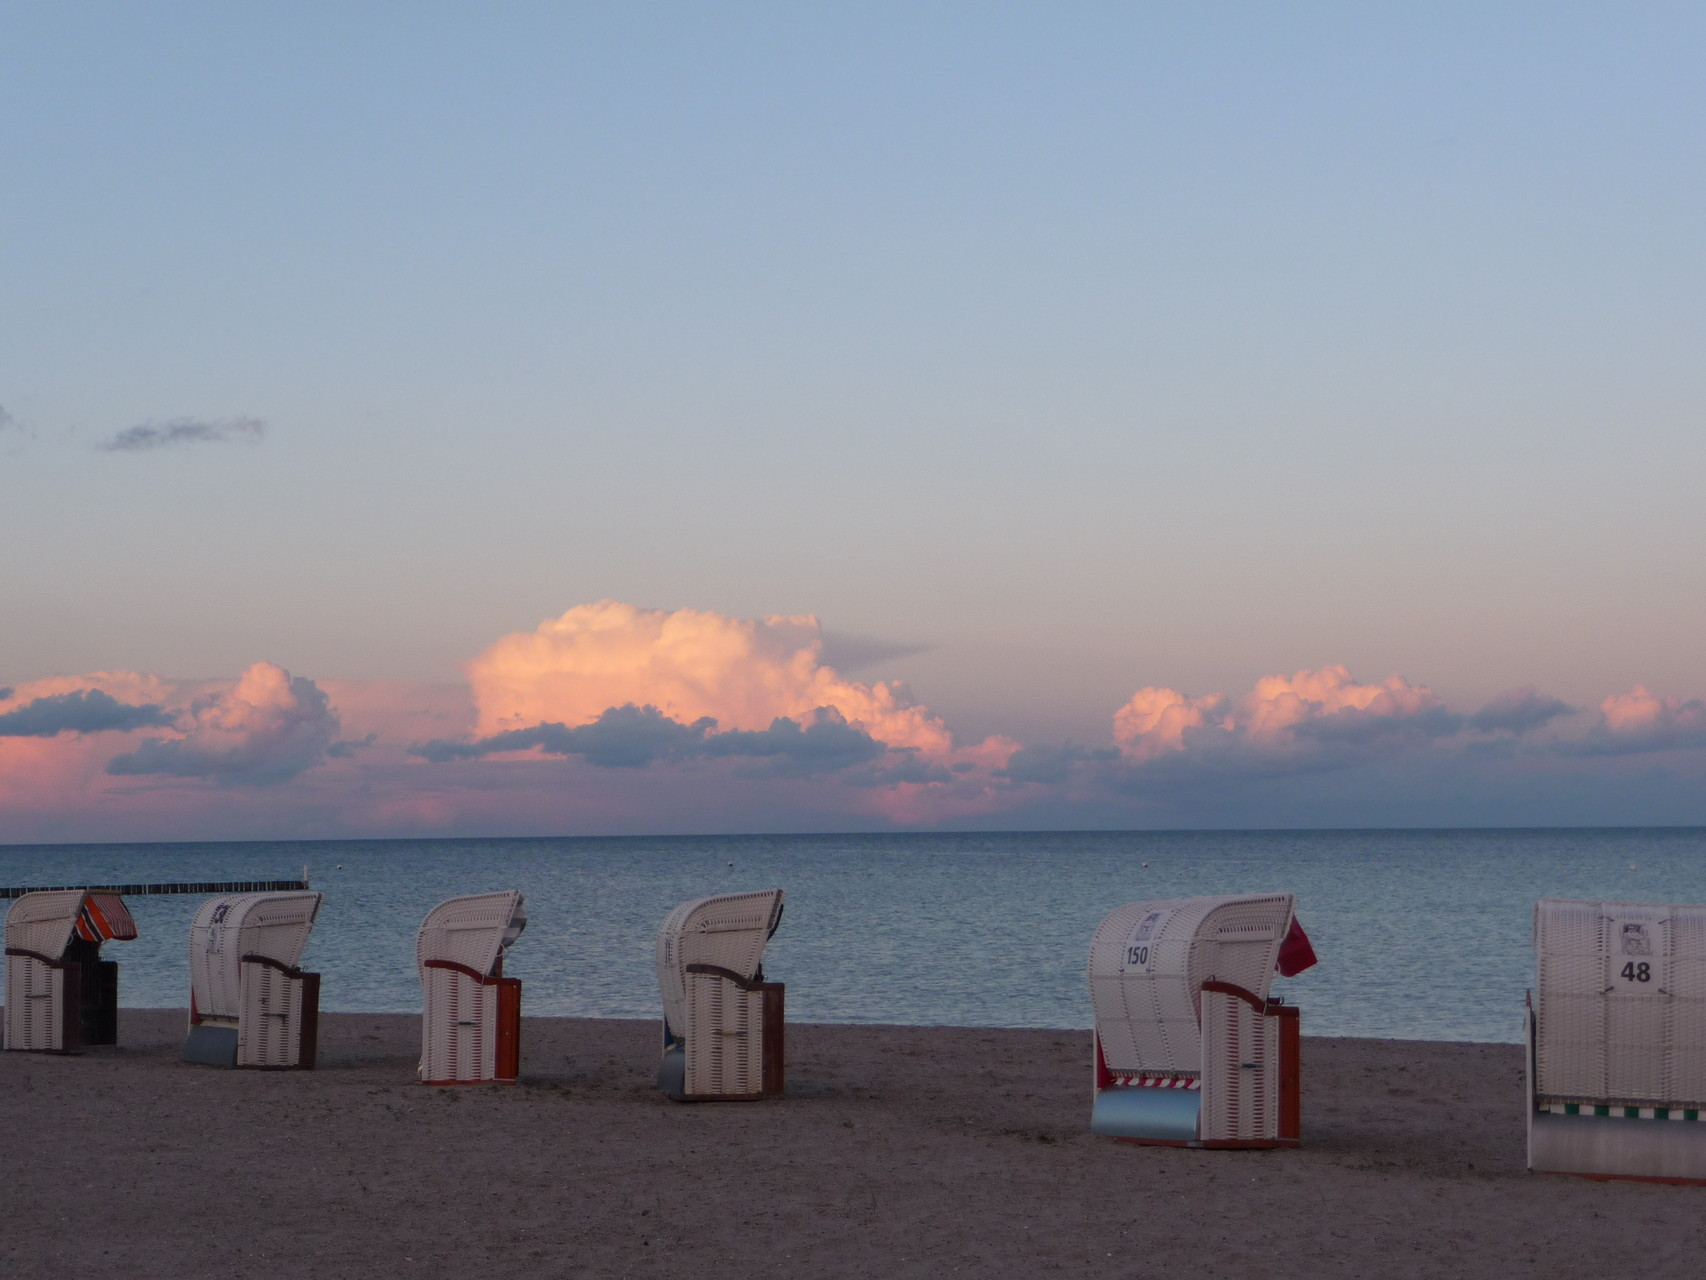 Strandkörbe in der Abendsonne